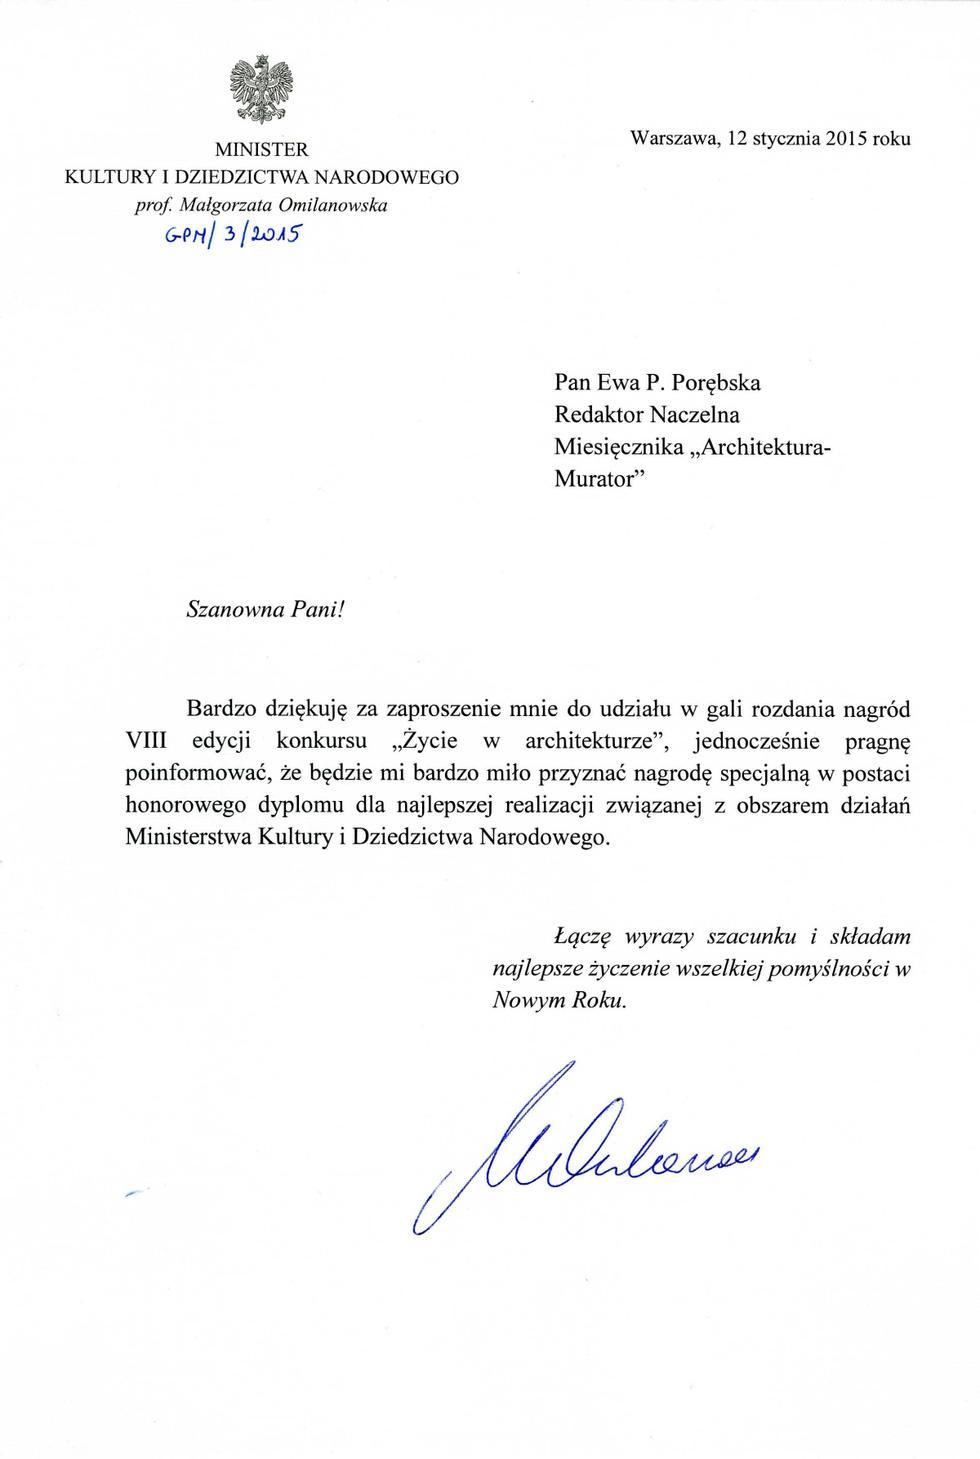 Pismo minister Omilanowska